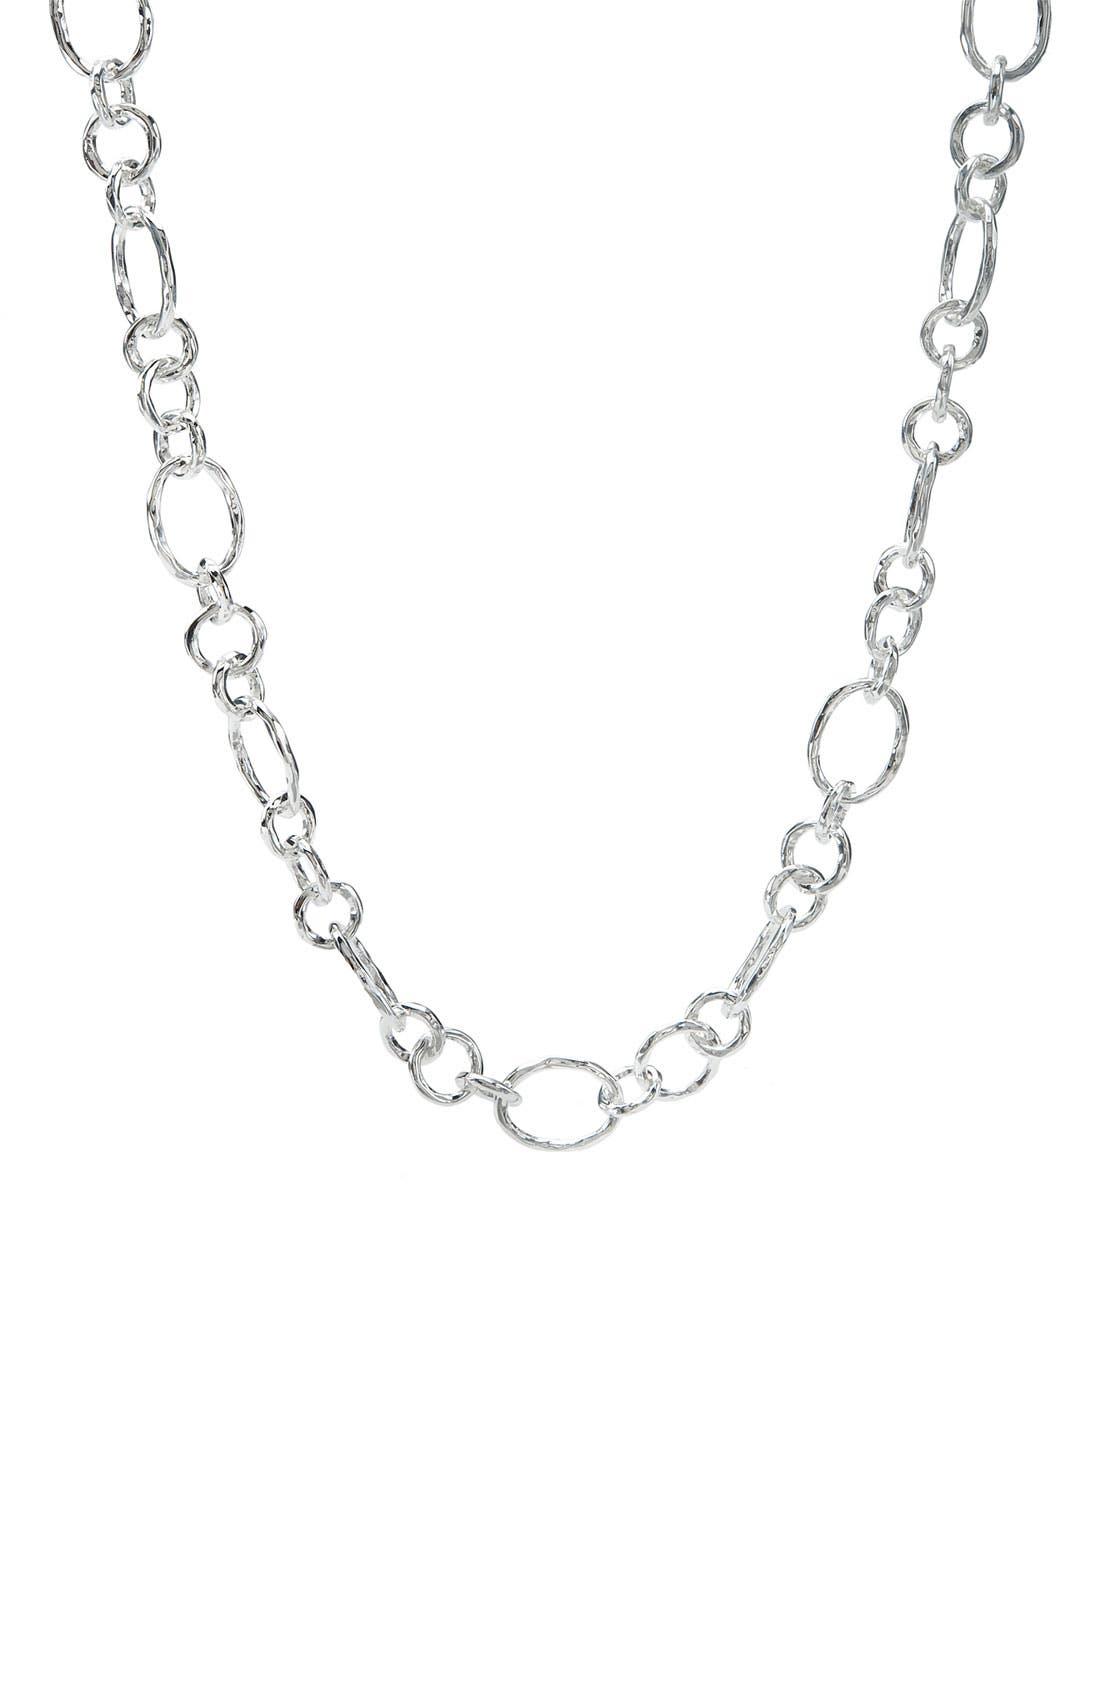 Main Image - Ippolita 'Glamazon' Chain Necklace